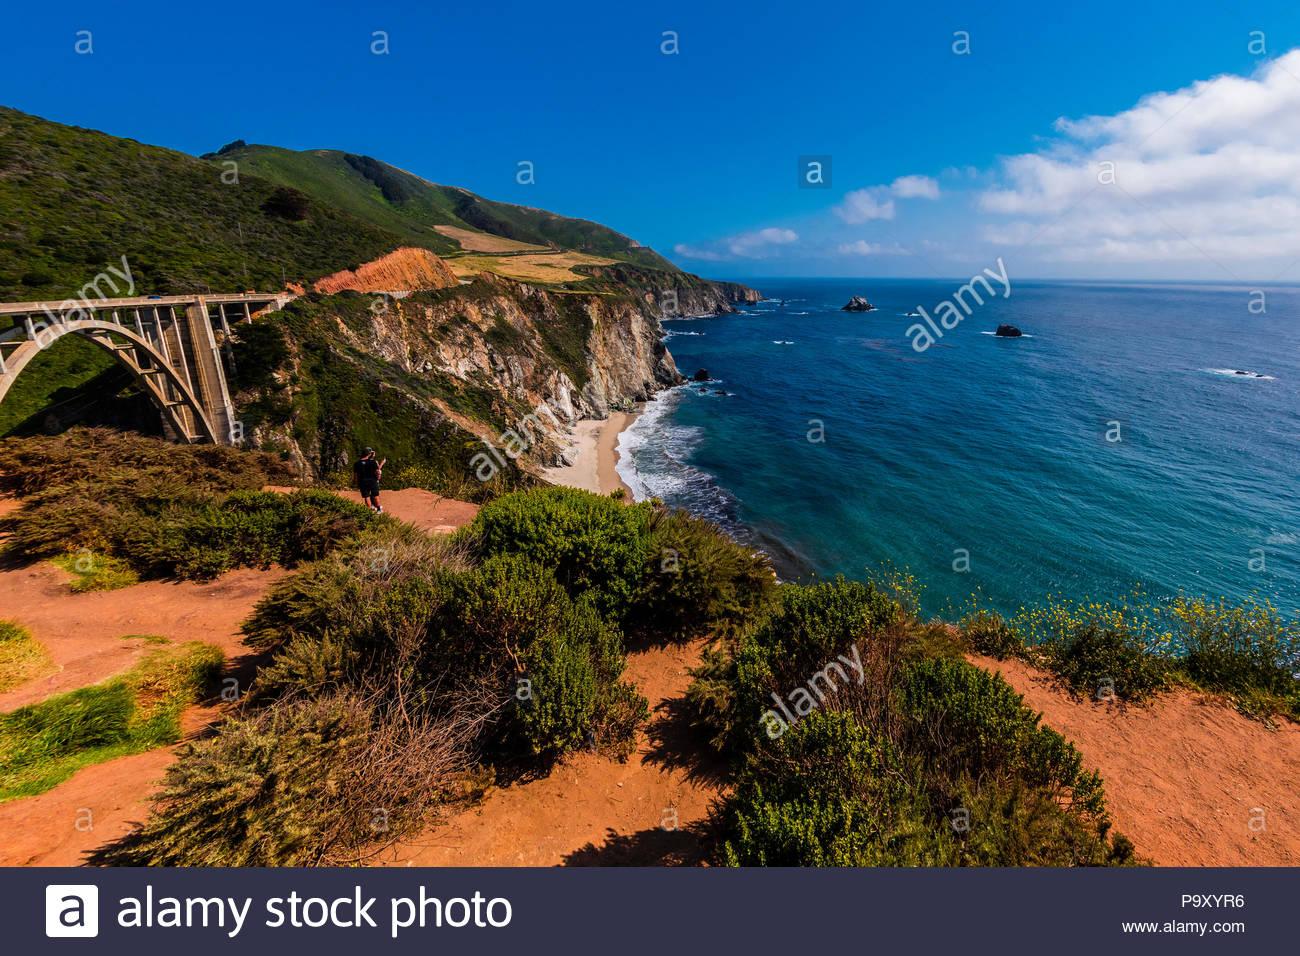 The Bixby Bridge along the Big Sur coast between Carmel Highlands and Big Sur, California USA. Stock Photo